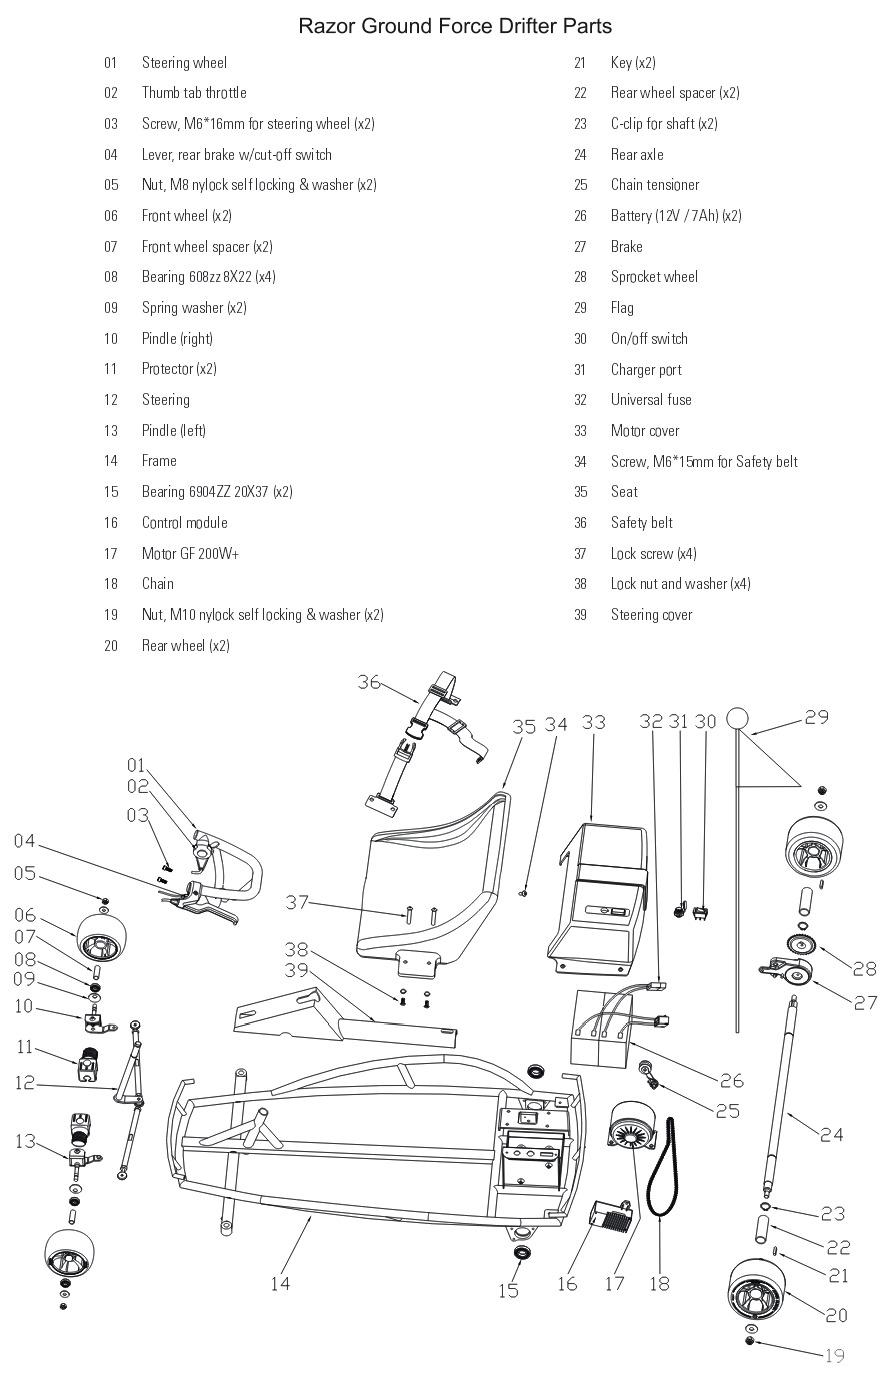 Razor E300 Rear Wheel Diagrams : 30 Wiring Diagram Images